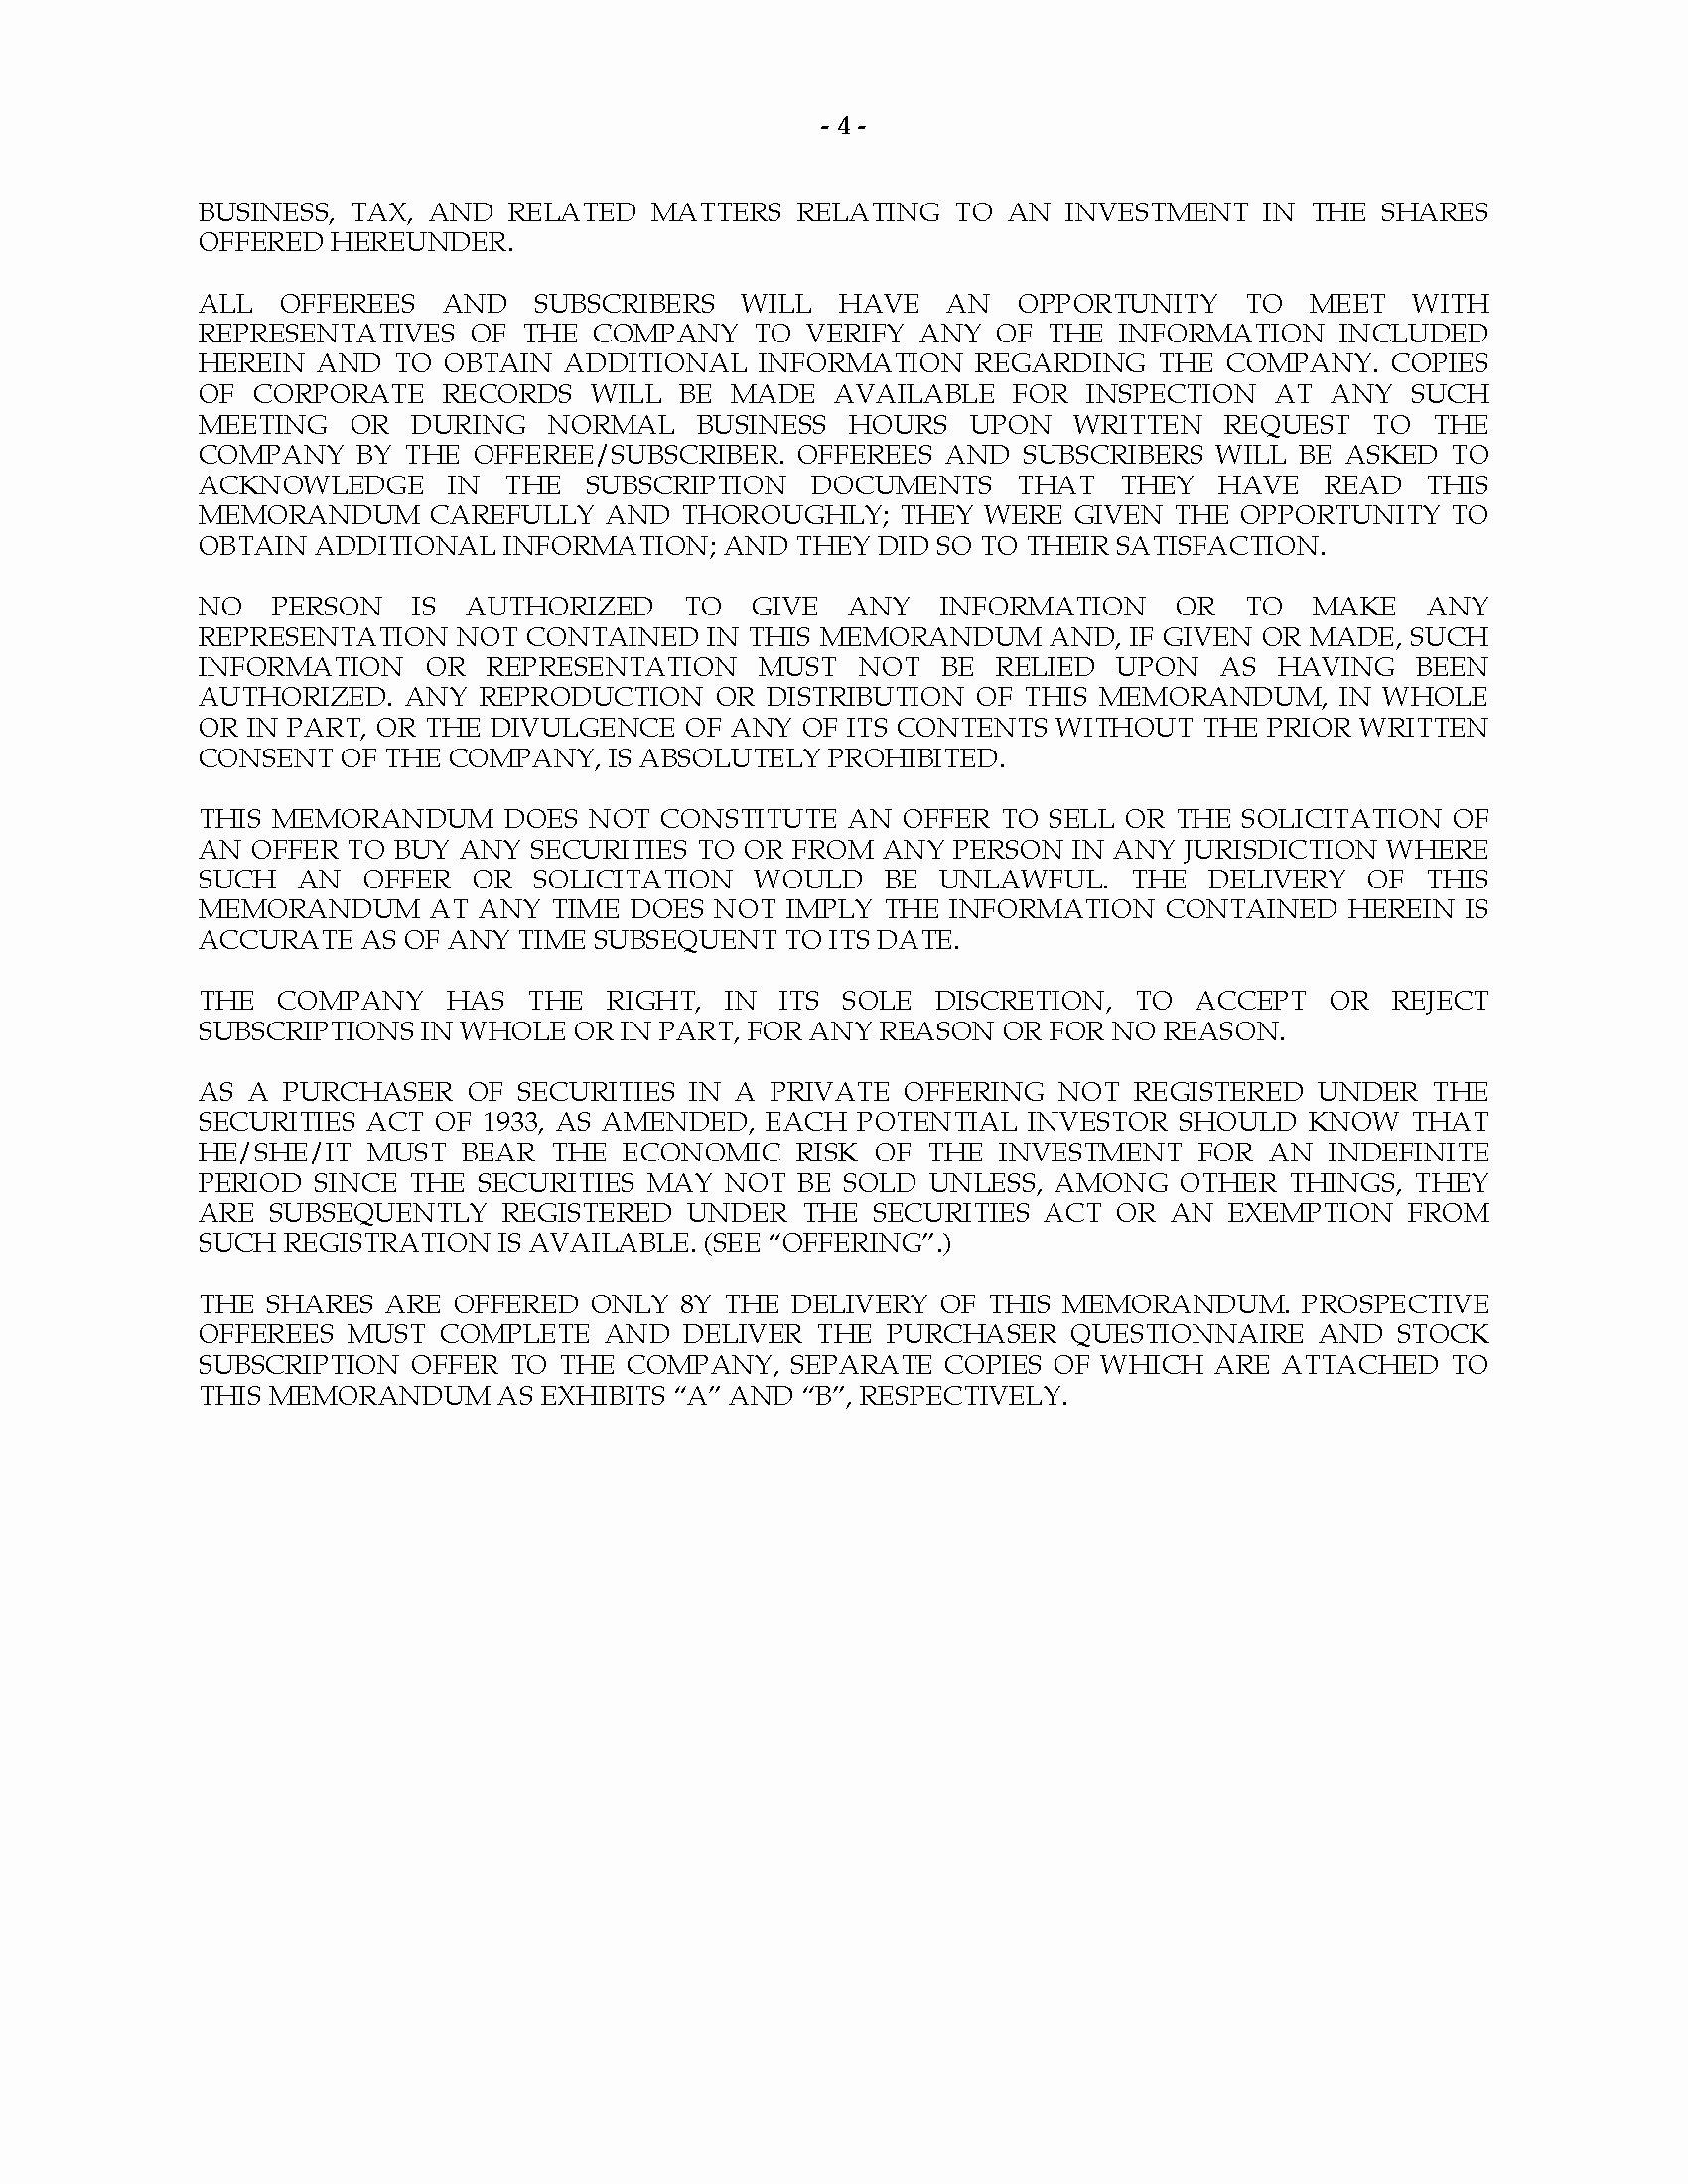 Private Placement Memorandum Template Inspirational Nevada Private Placement Memorandum for Stock In Line